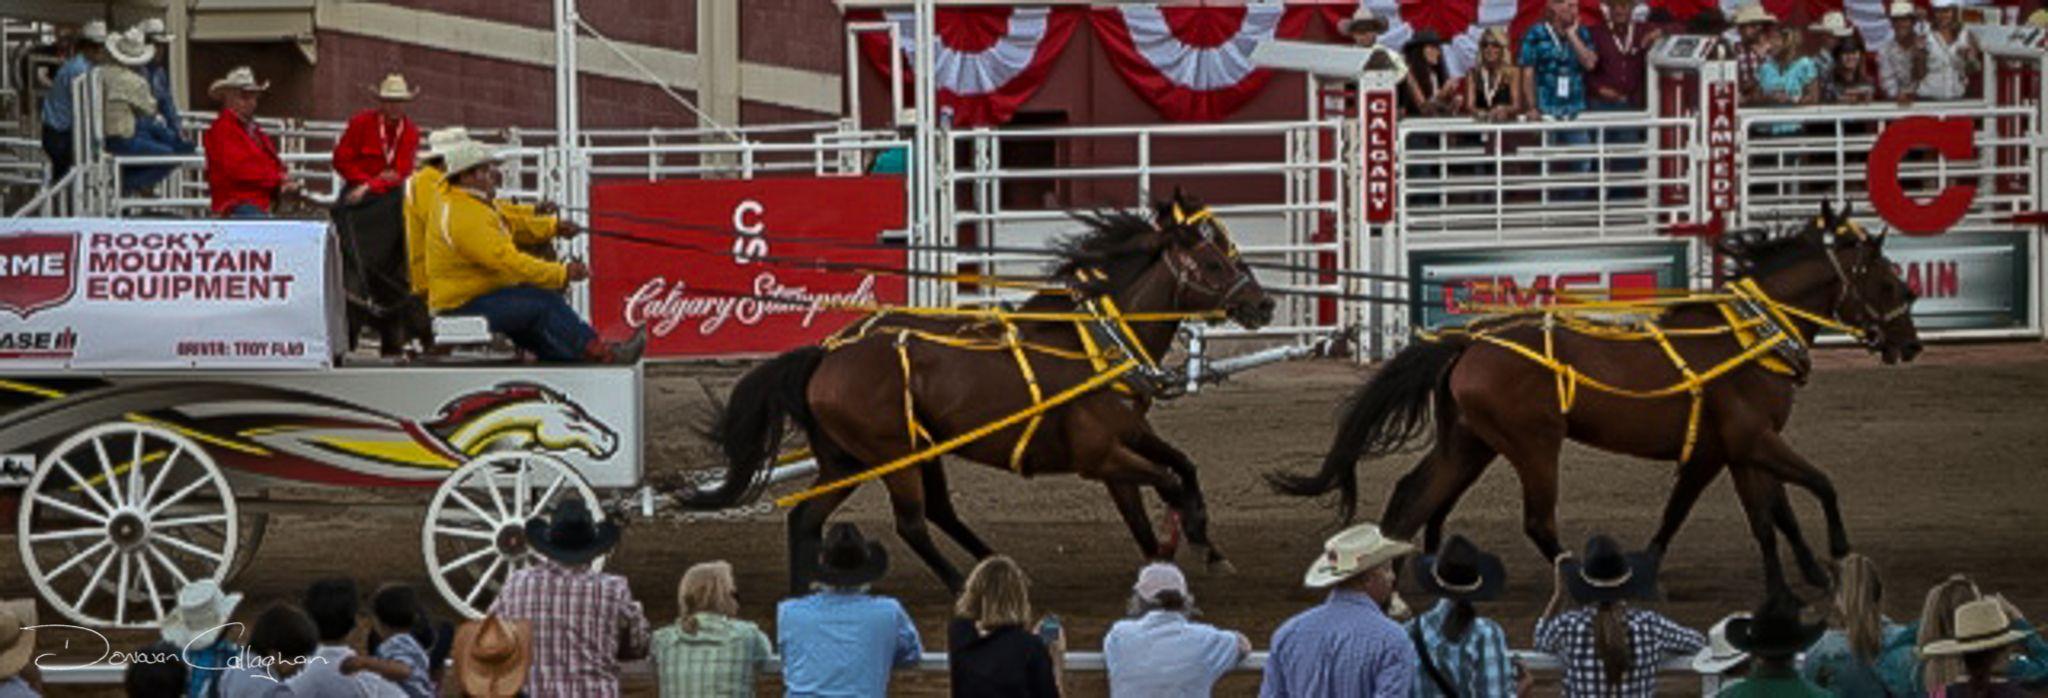 Calgary Stampede Chuck wagon racing, Canada